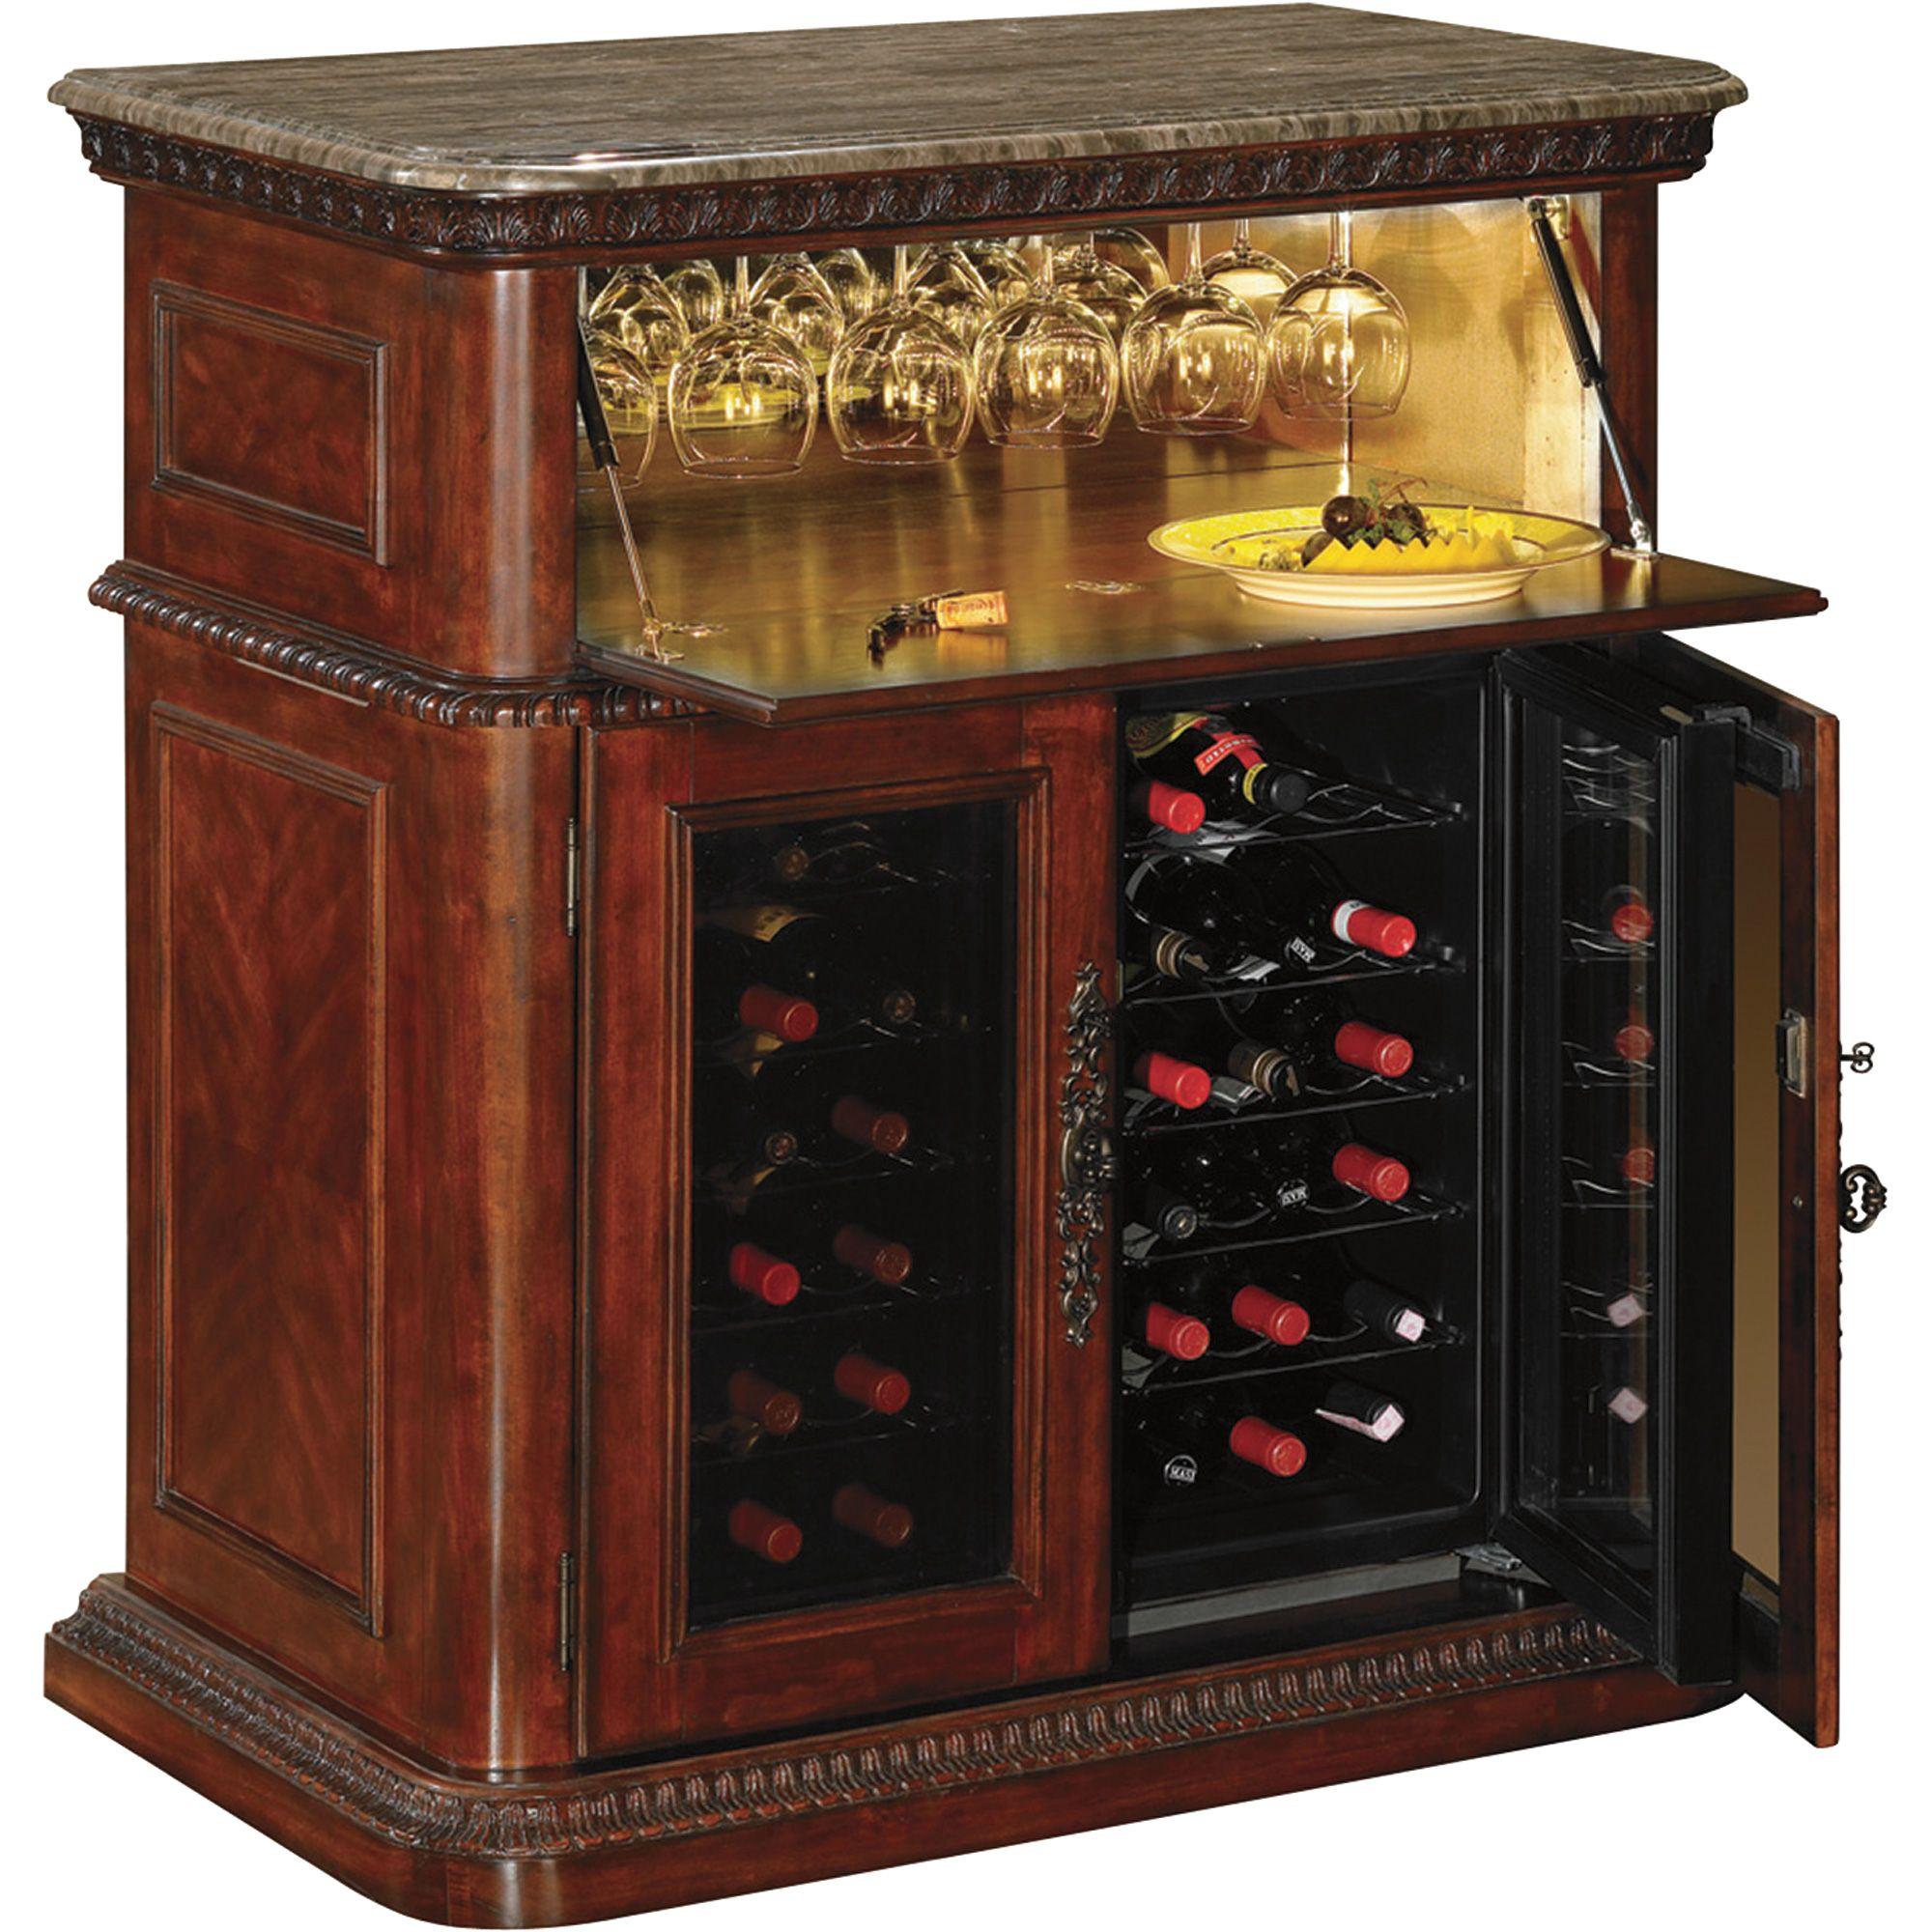 Tresanti Rutherford Wine Bar Cooler Model 41dc387vch0233